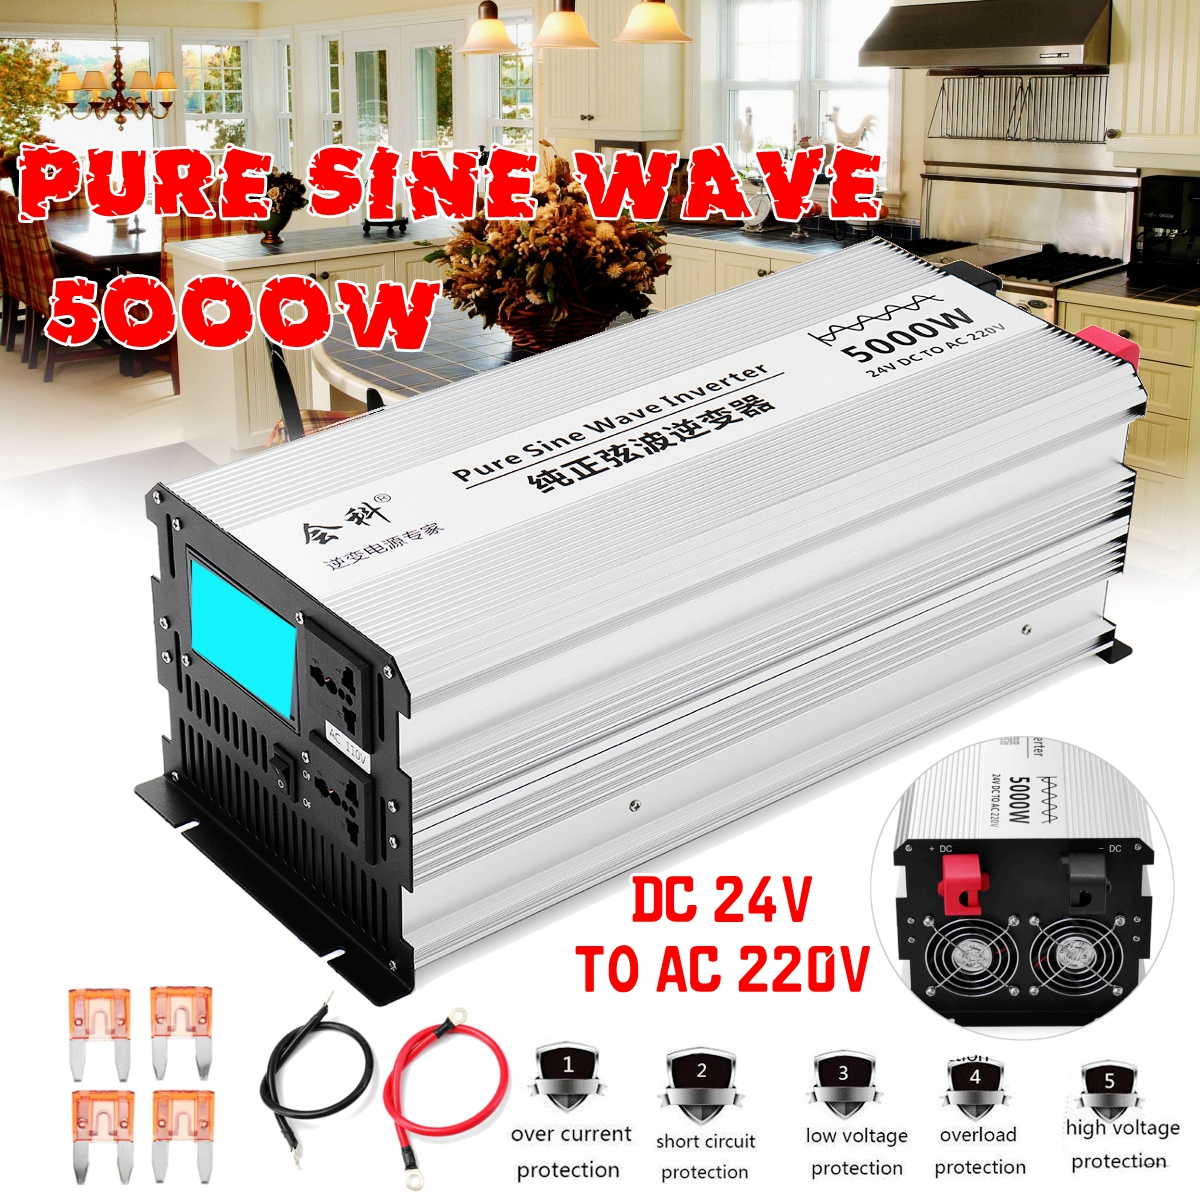 Onduleur onde sinusoïdale pure 2500 w 5000 w Pic 50 hz DC 12 v/24 v/48 v à AC 110 v/220 v Tension Transformateur Converte LED affichage Onduleur